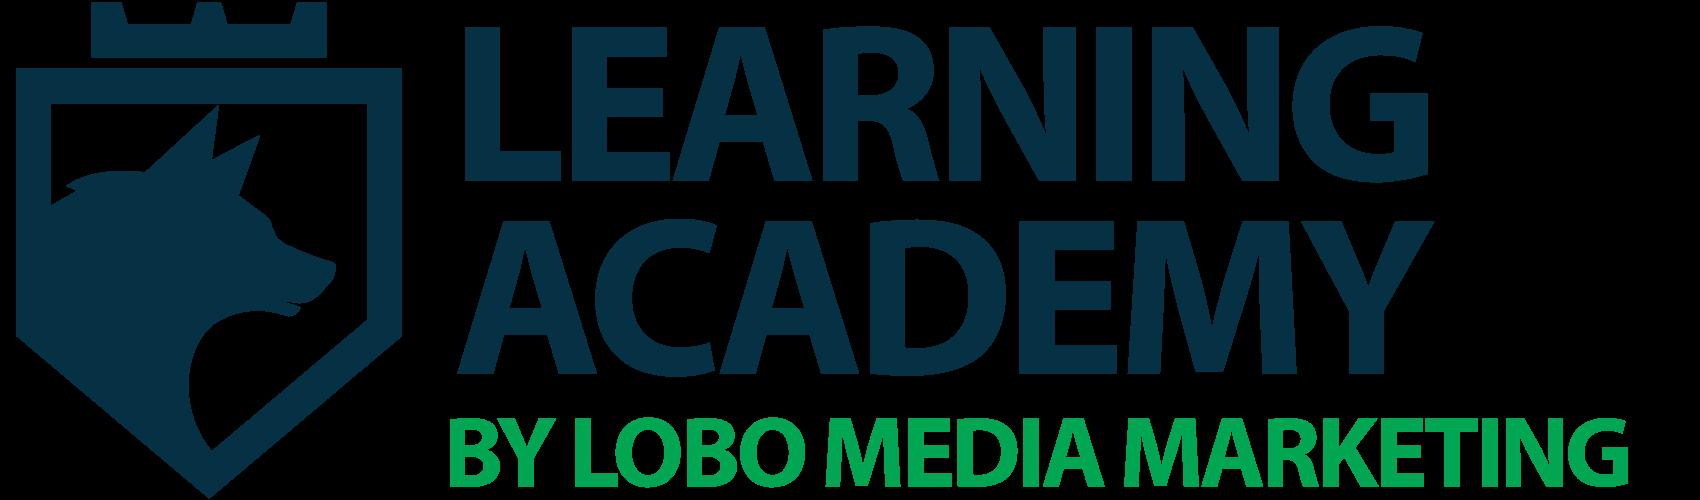 Lobo Media Marketing Logo